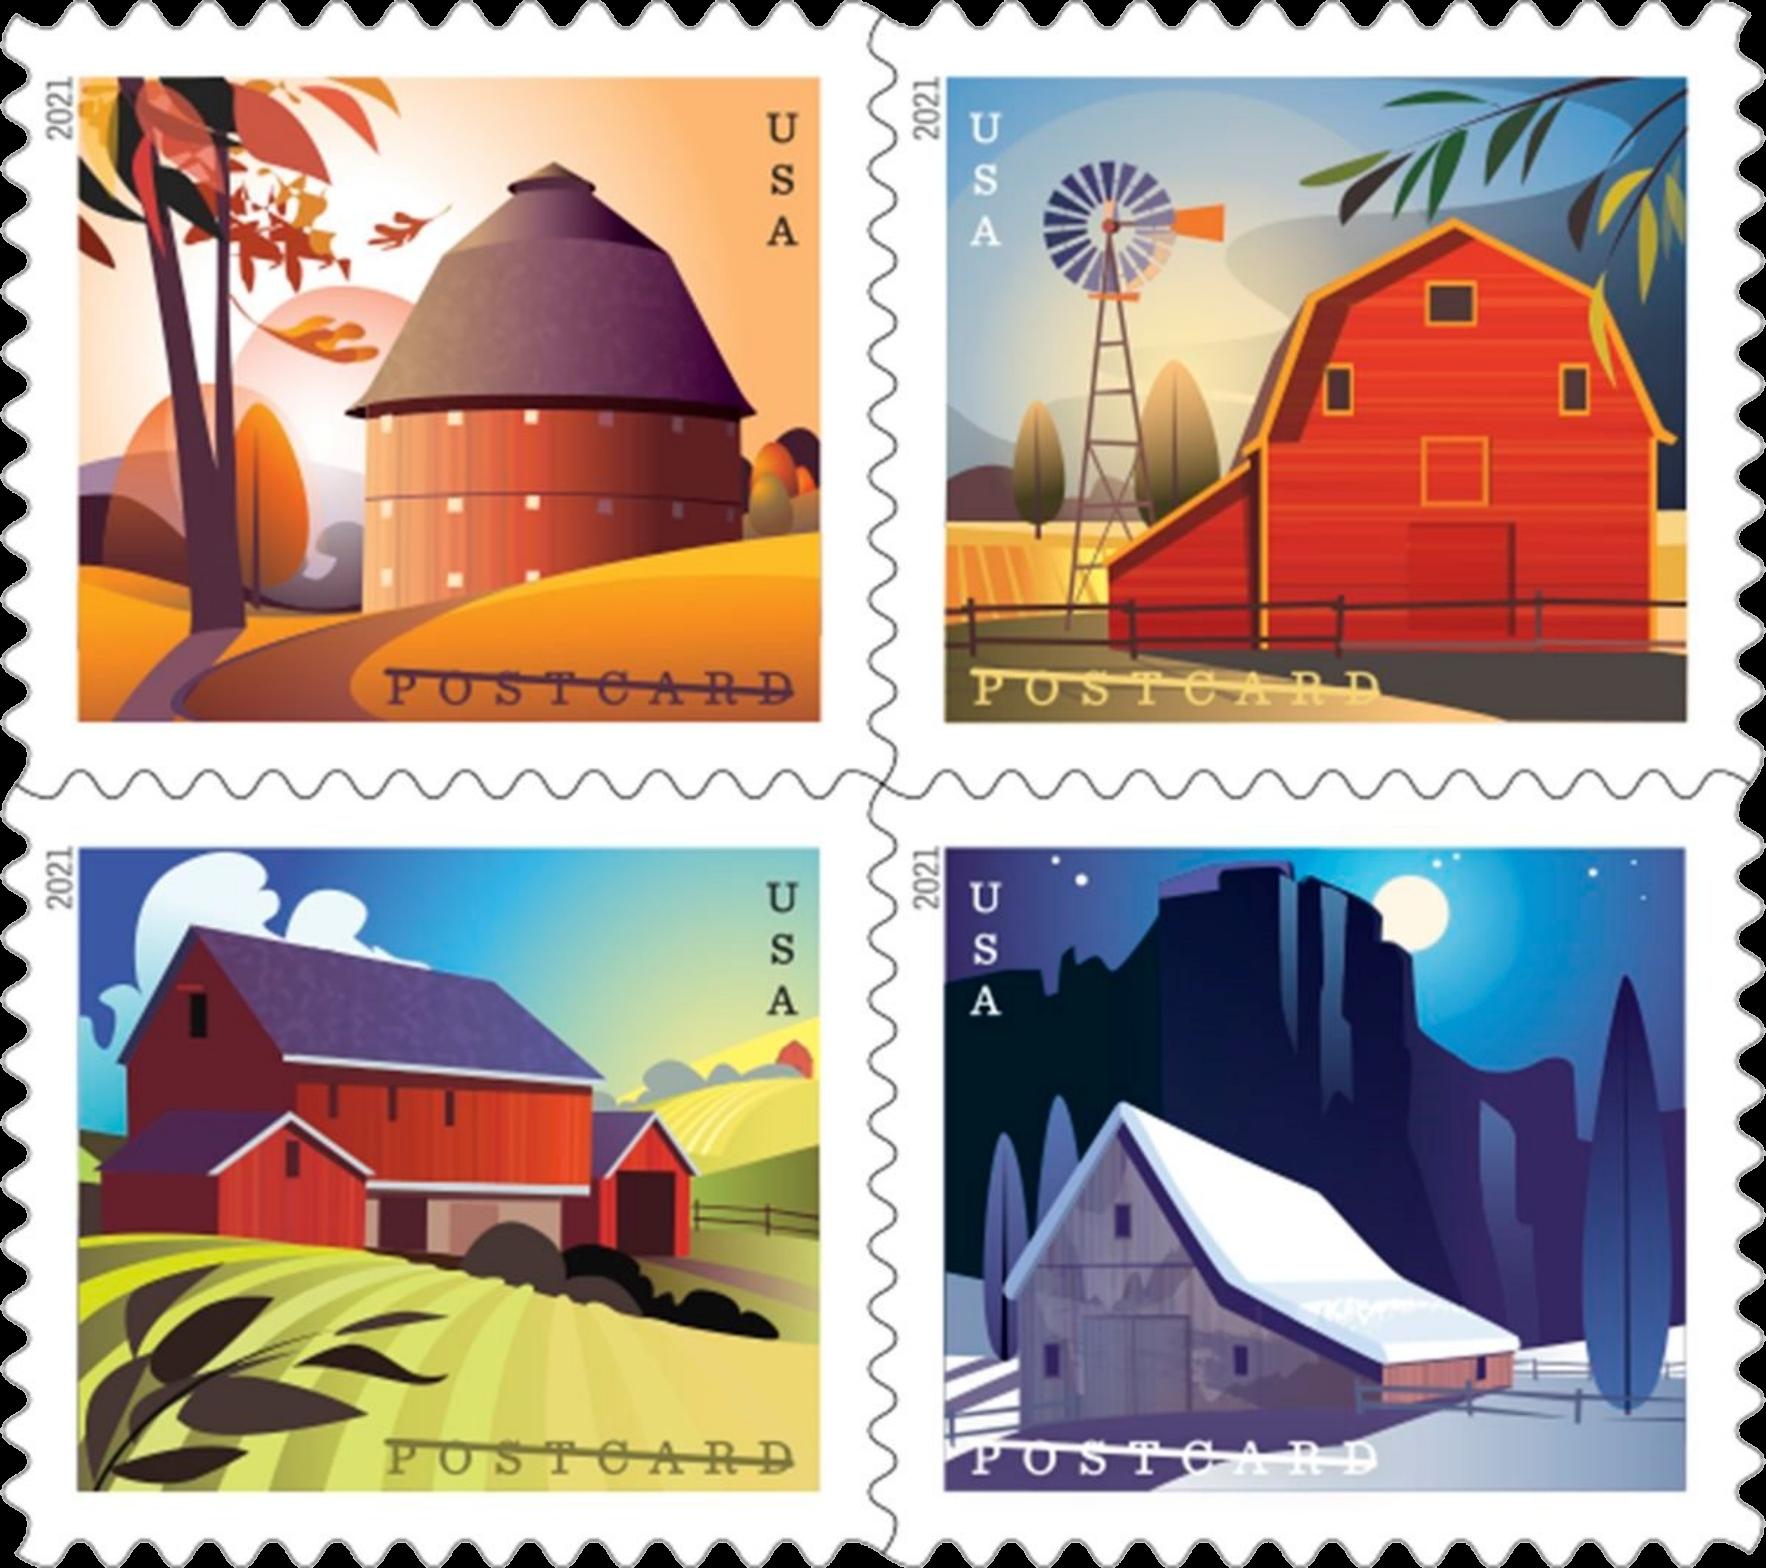 United States: Barns, 24 January 2021